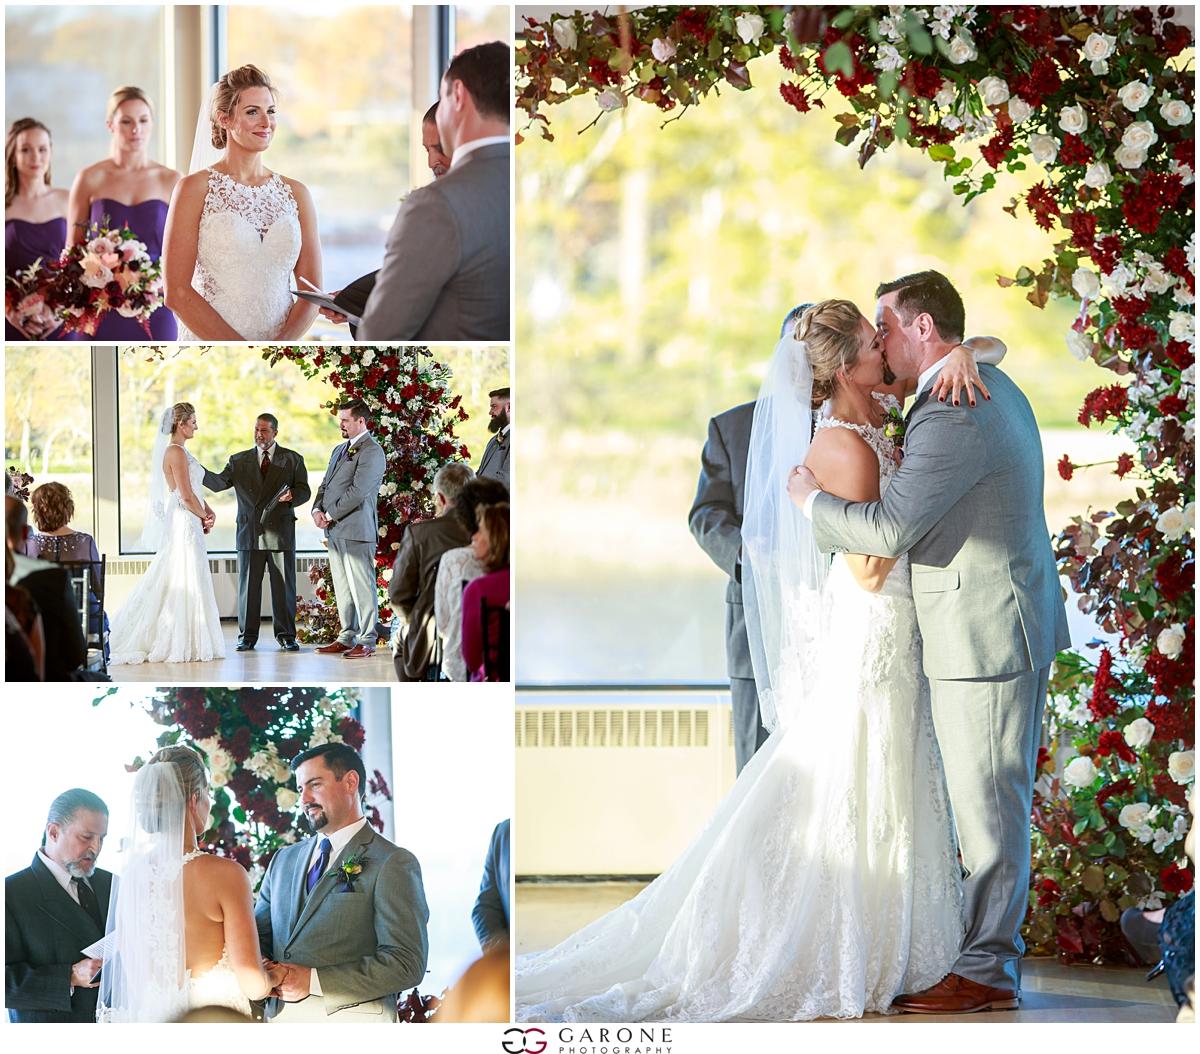 Kate_Chris_Atlantica_Cohasset_Massachusettes_Boston_Wedding_Photography_Garone_Photography_0028.jpg